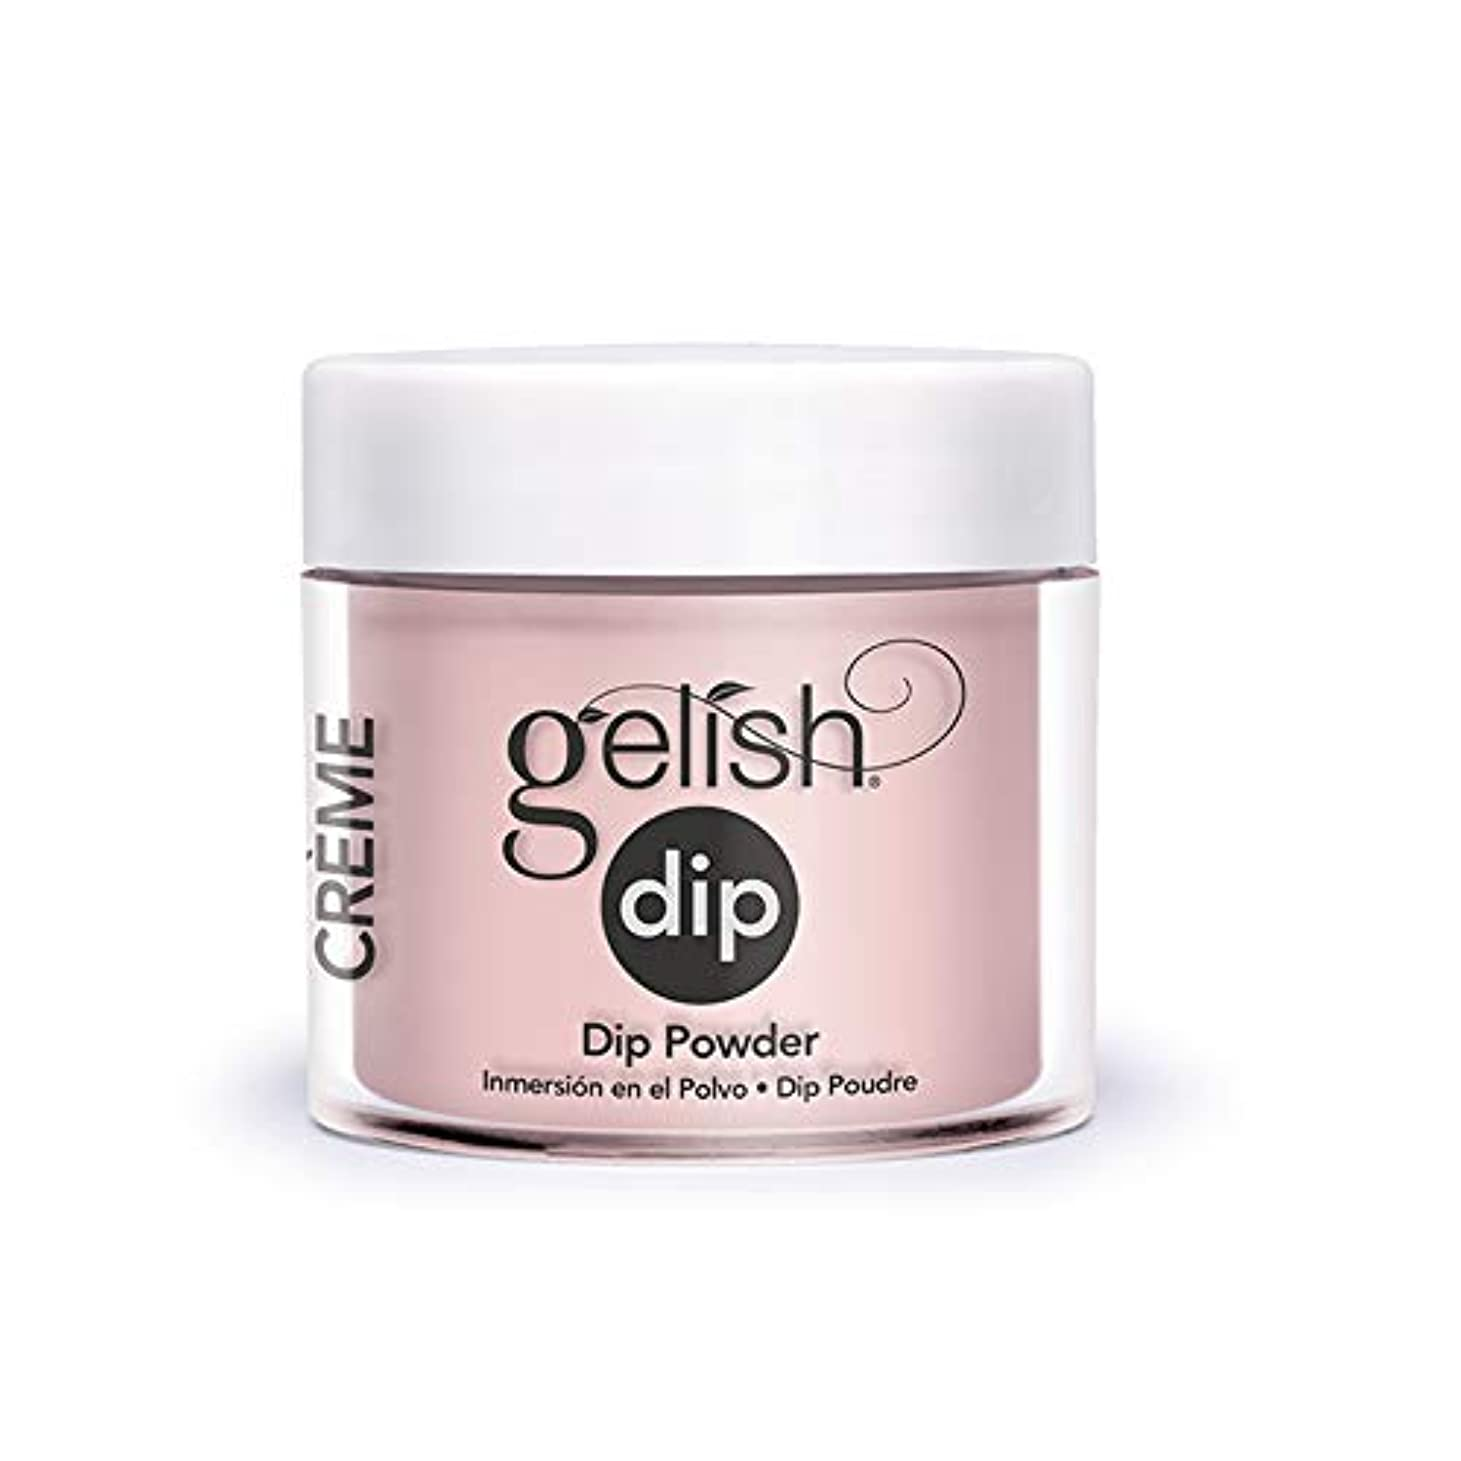 飾る食欲音声学Harmony Gelish - Acrylic Dip Powder - Luxe Be a Lady - 23g/0.8oz